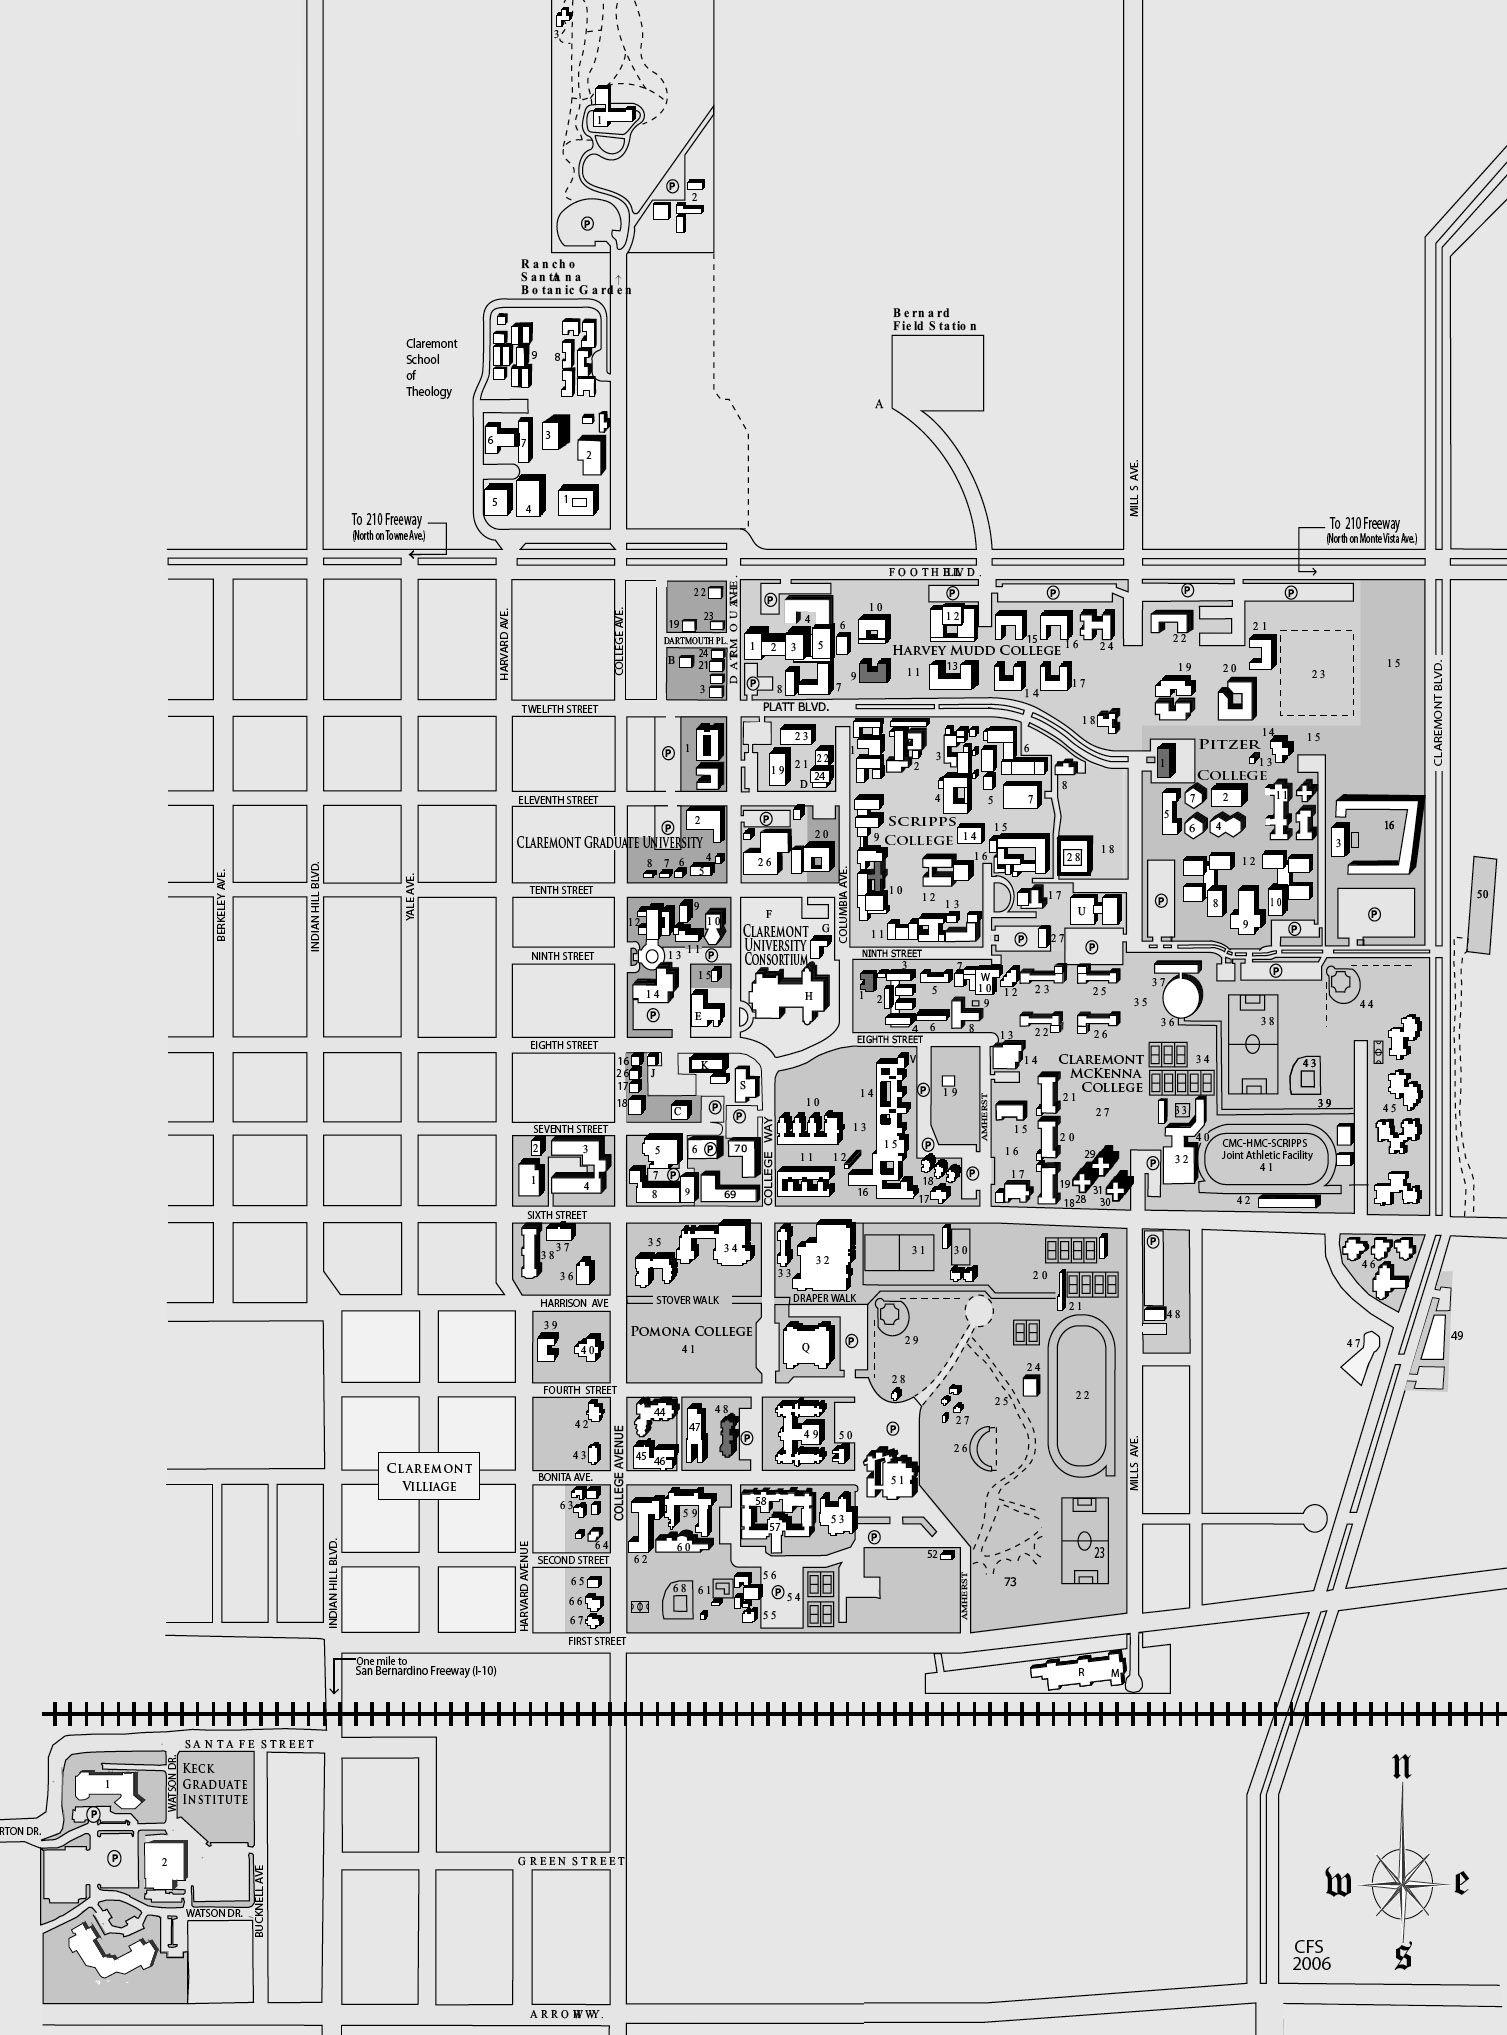 Los Angeles Harbor College Campus Map | Wiring Diagram Database